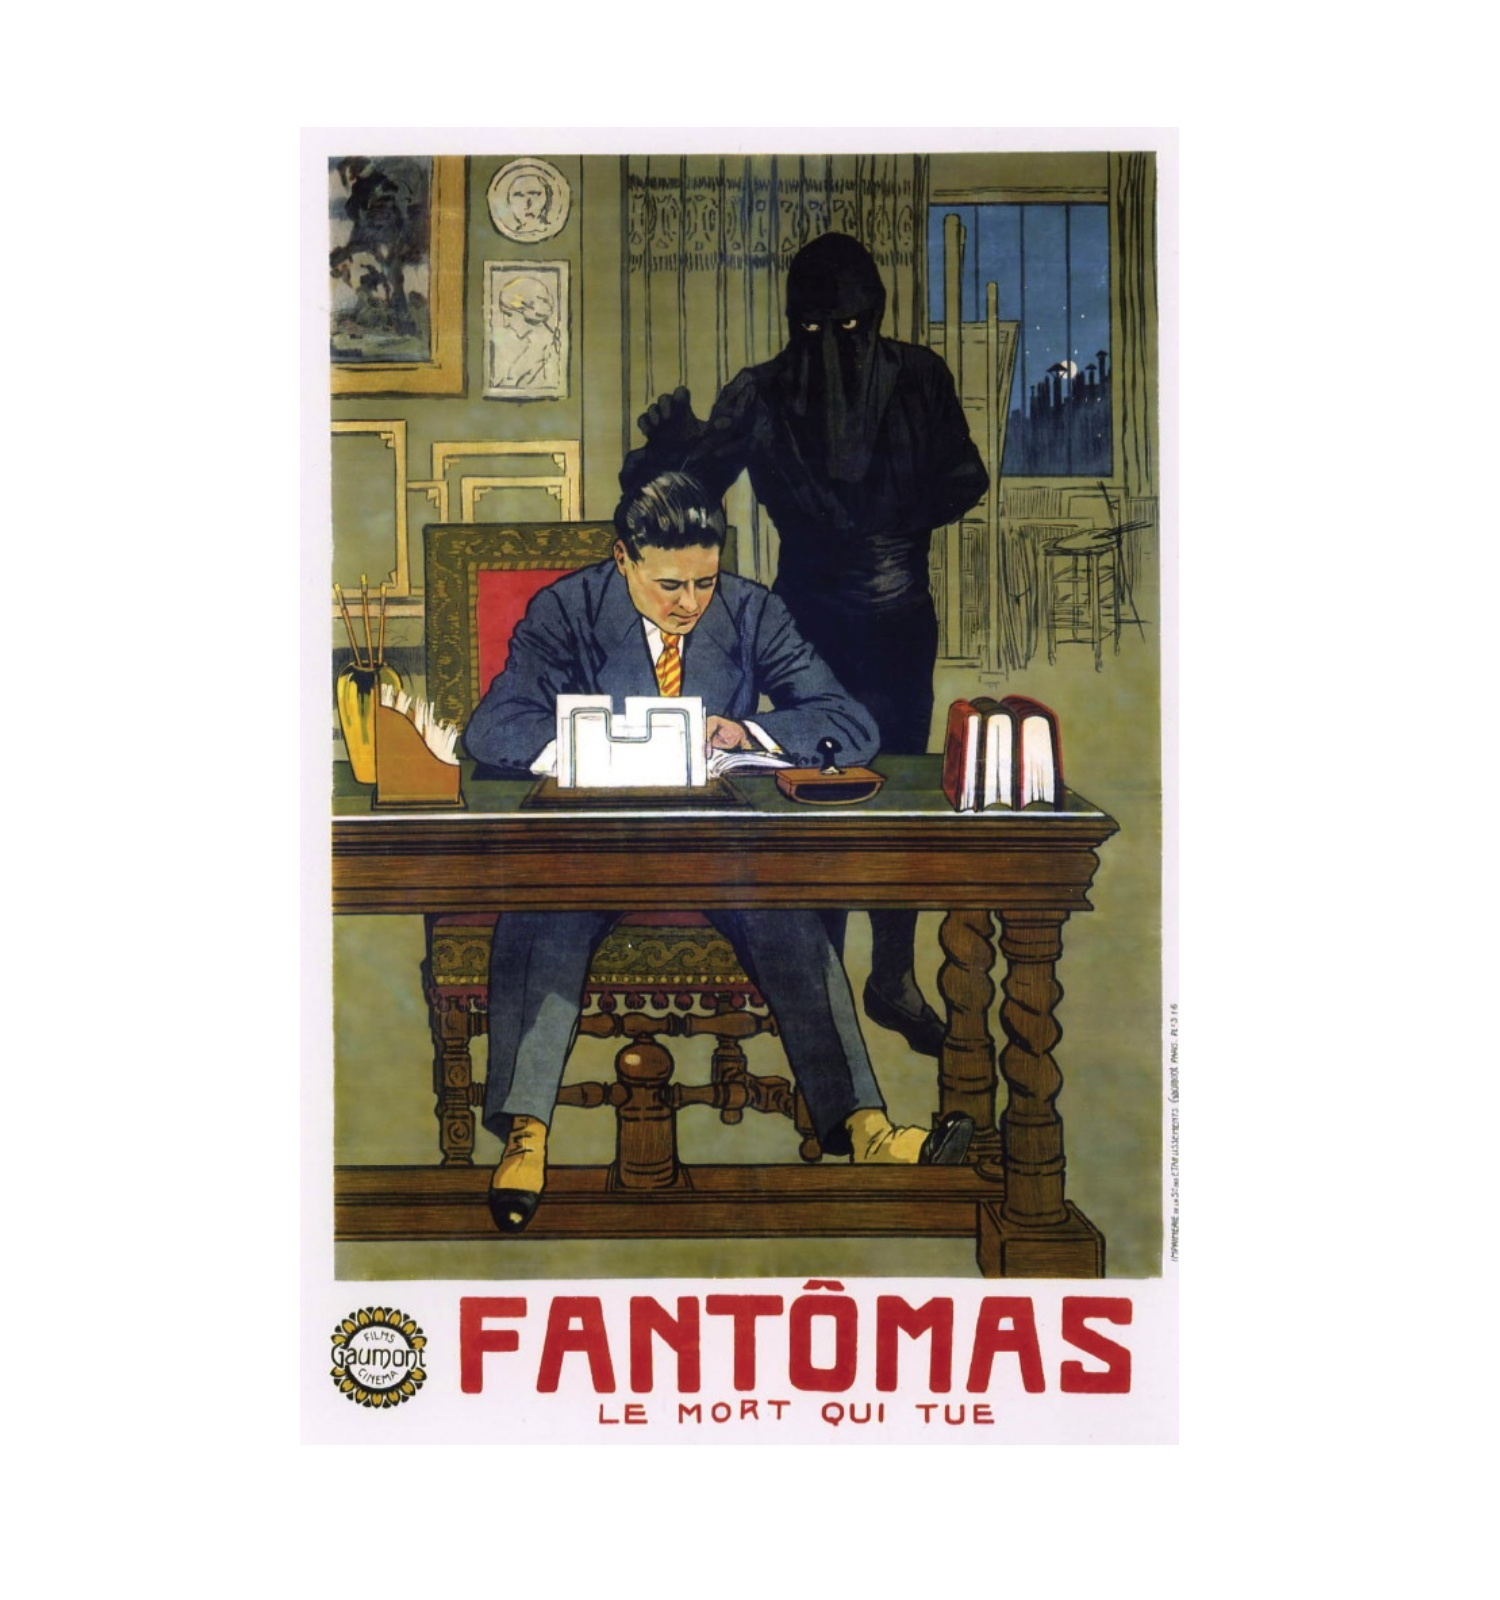 Fantômas de Louis Feuillade, Gaumont, domini públic